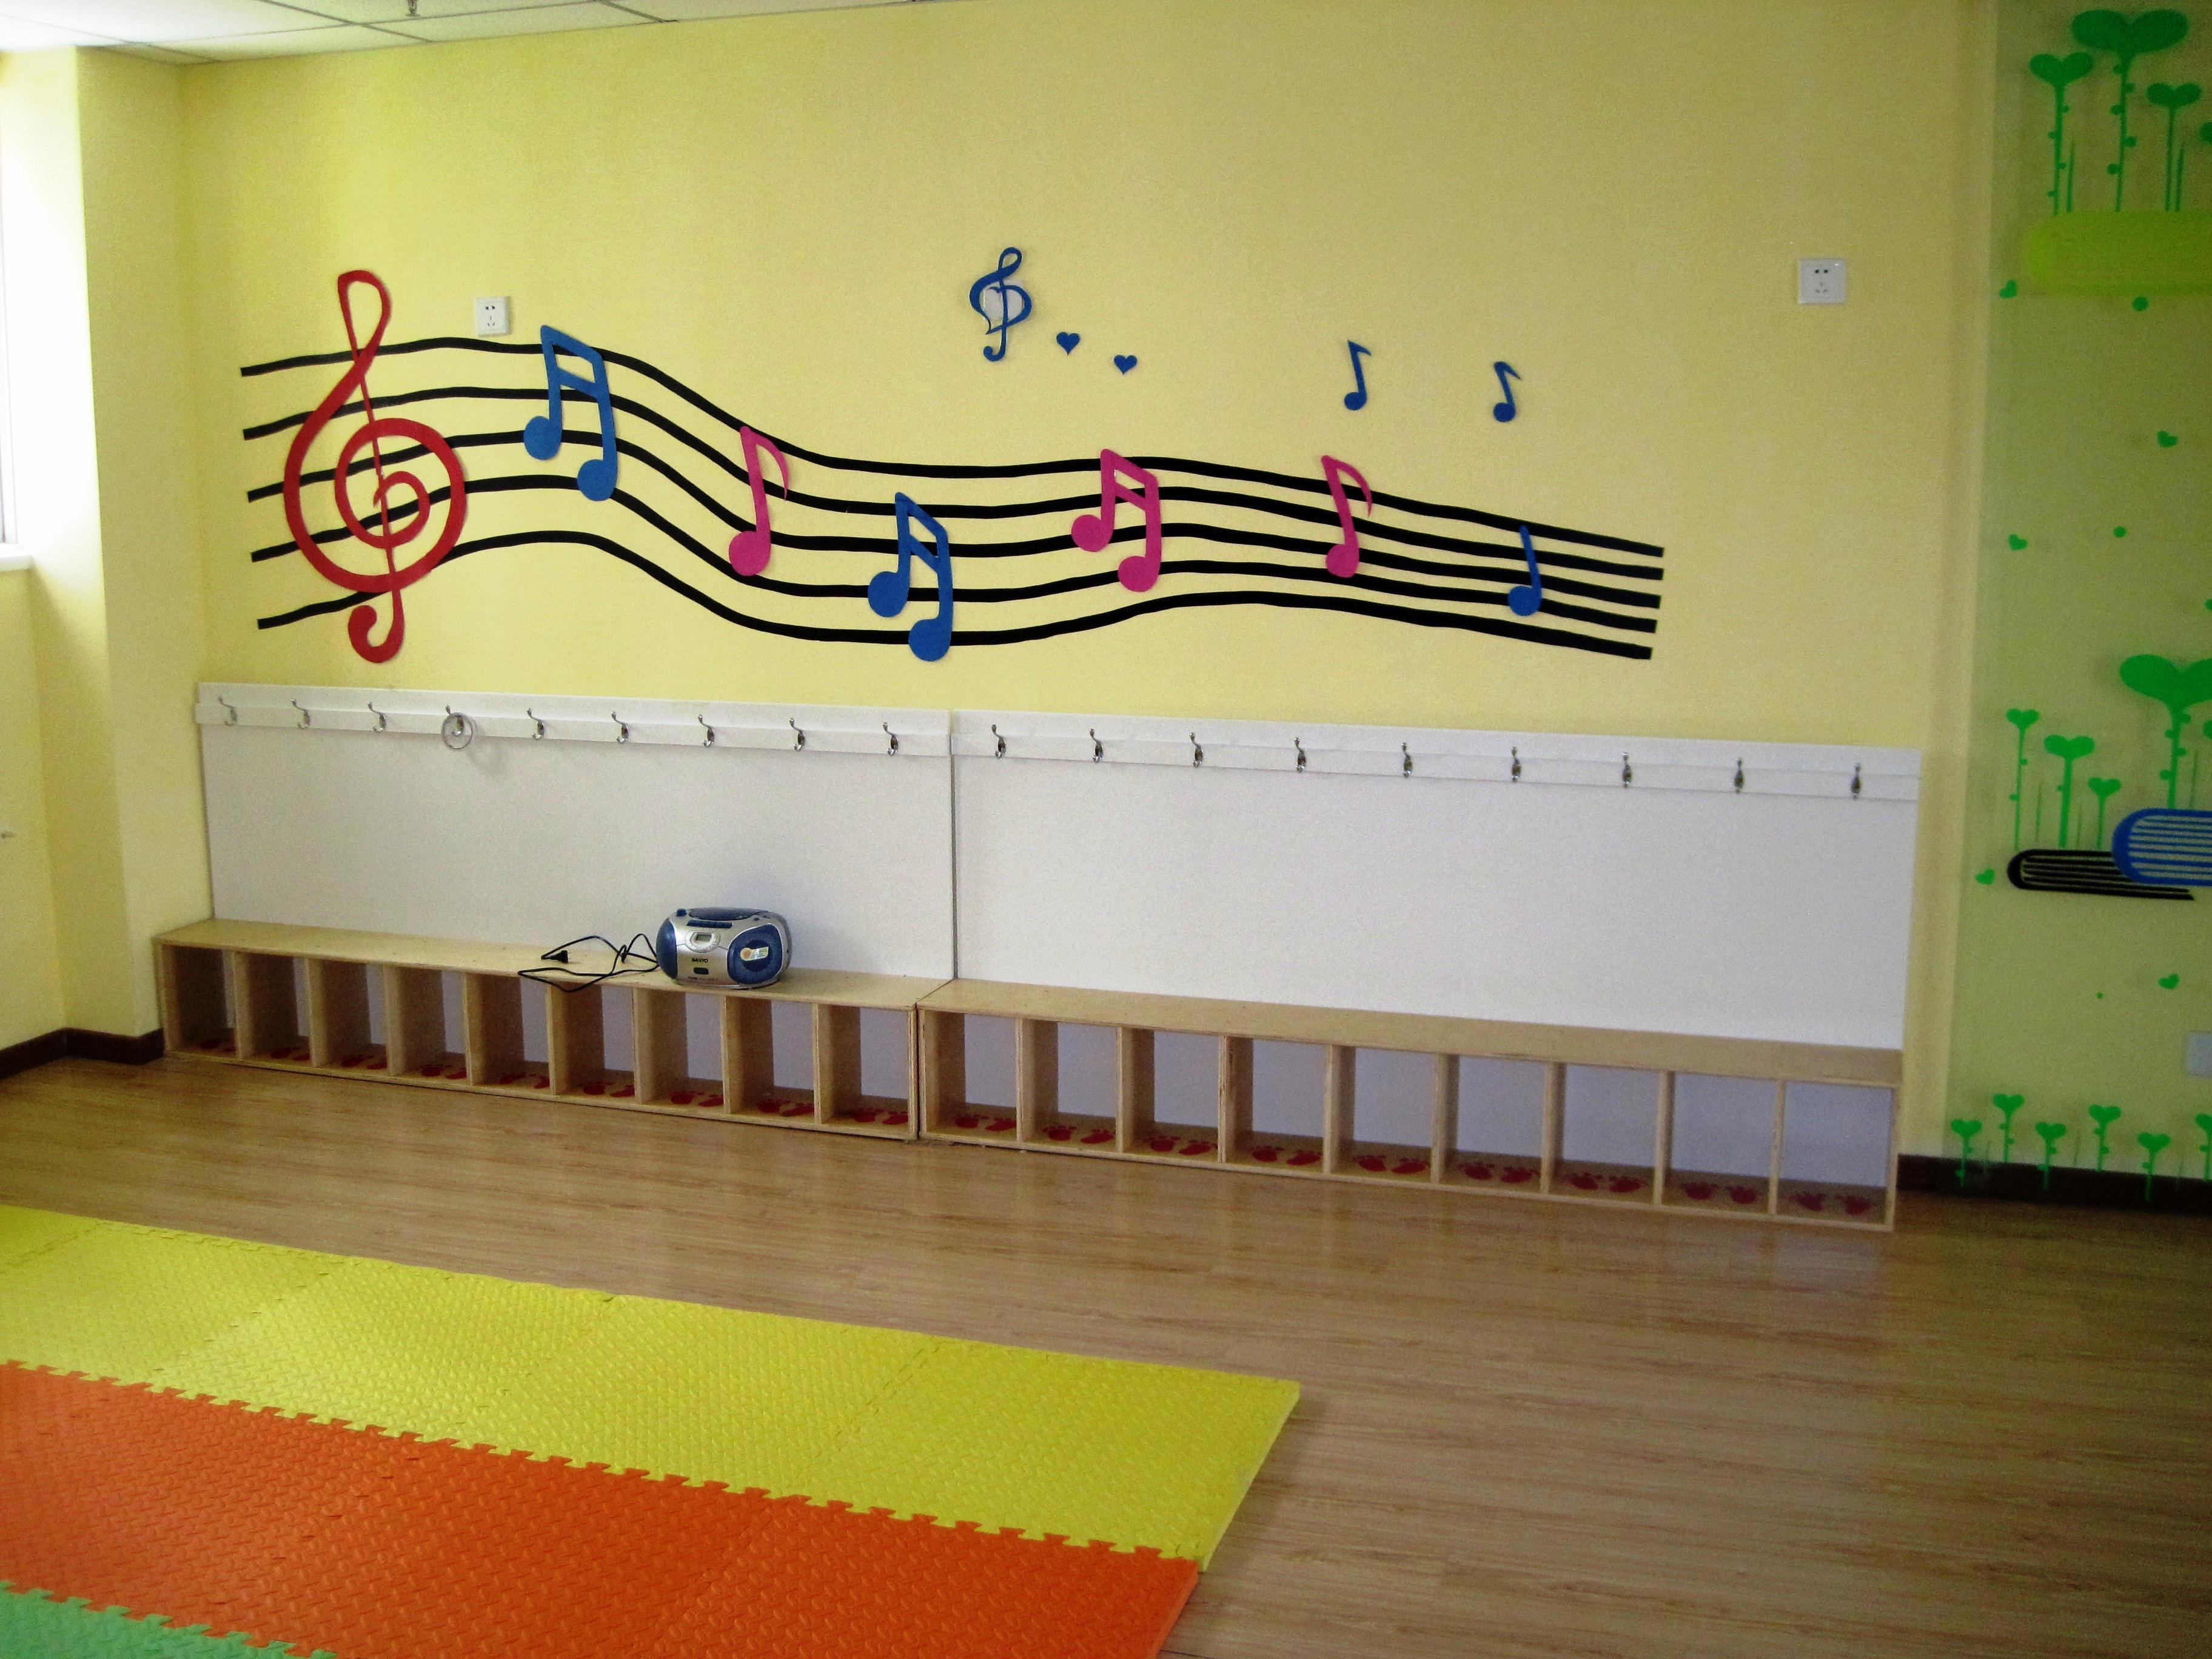 Music Classroom Decoration Ideas : Classroom miles apart